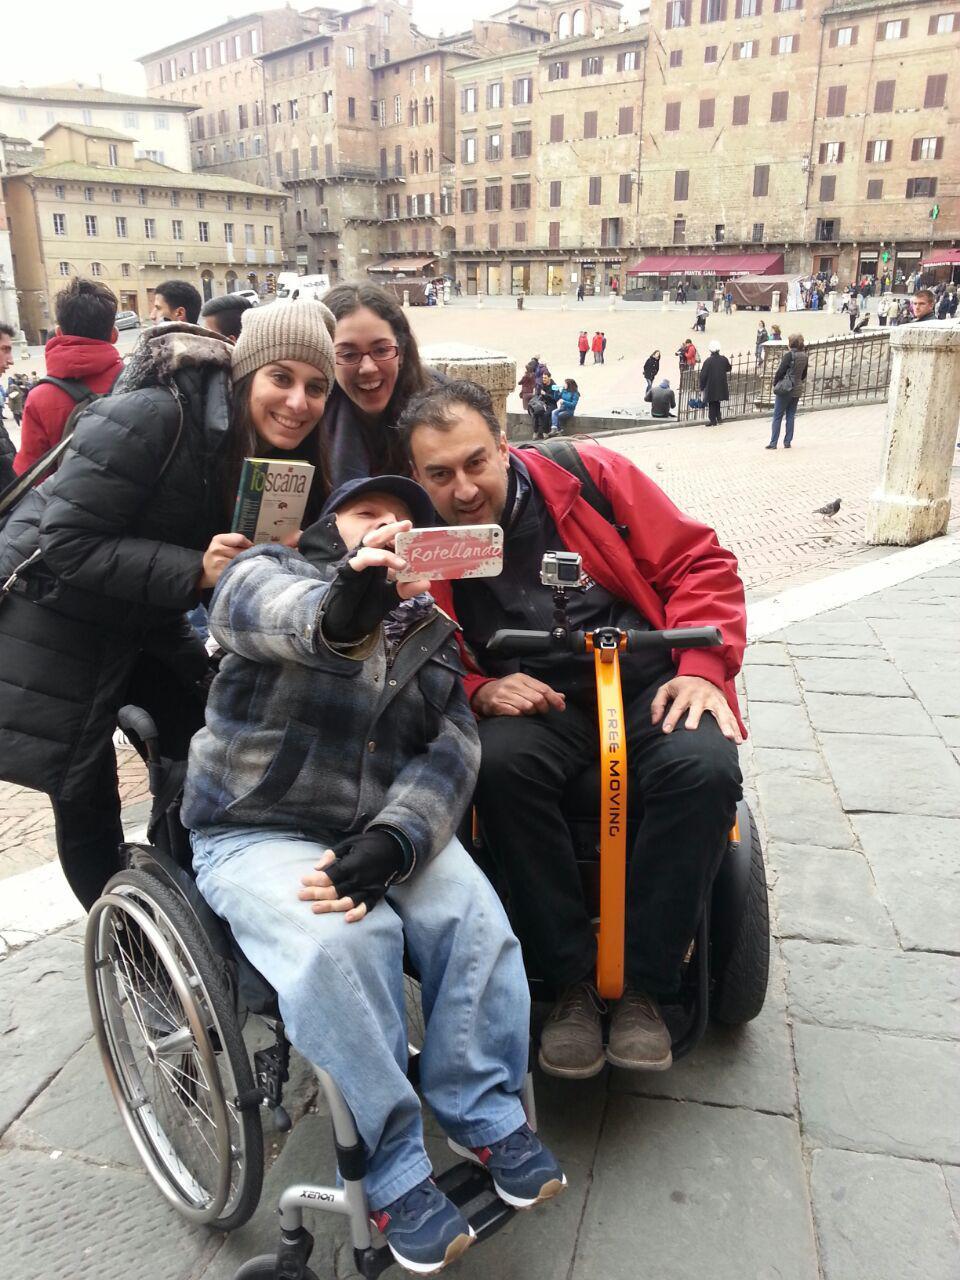 SIENA ITALYFORALL 8